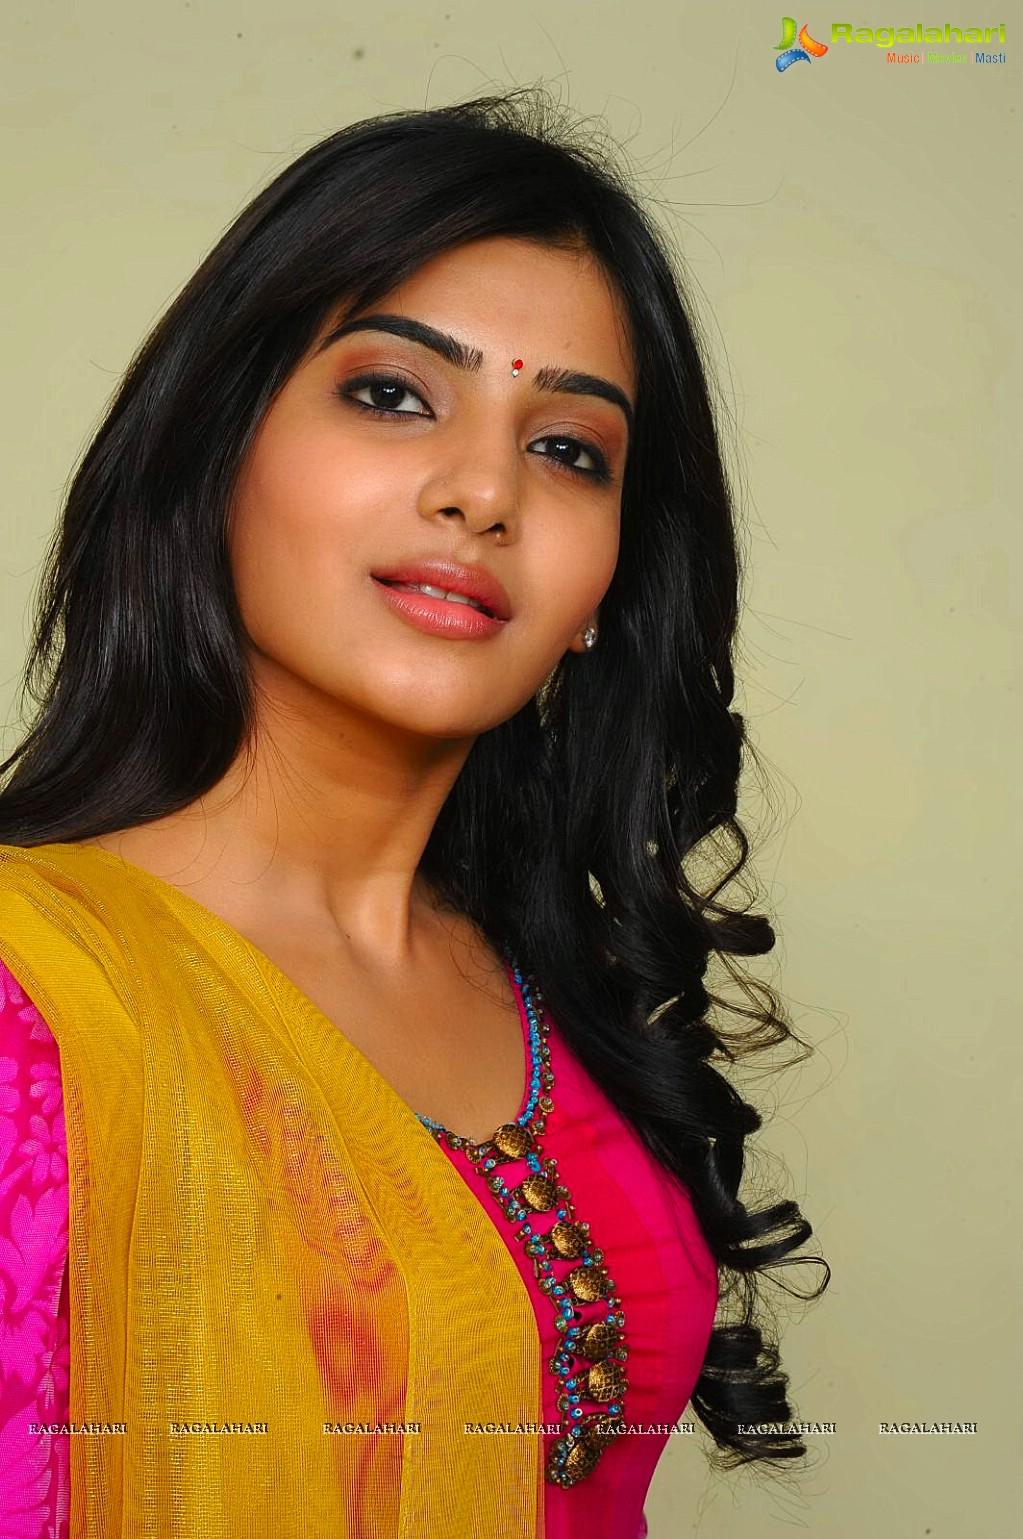 samantha image 32 | telugu hero gallery,images, photos, wallpapers